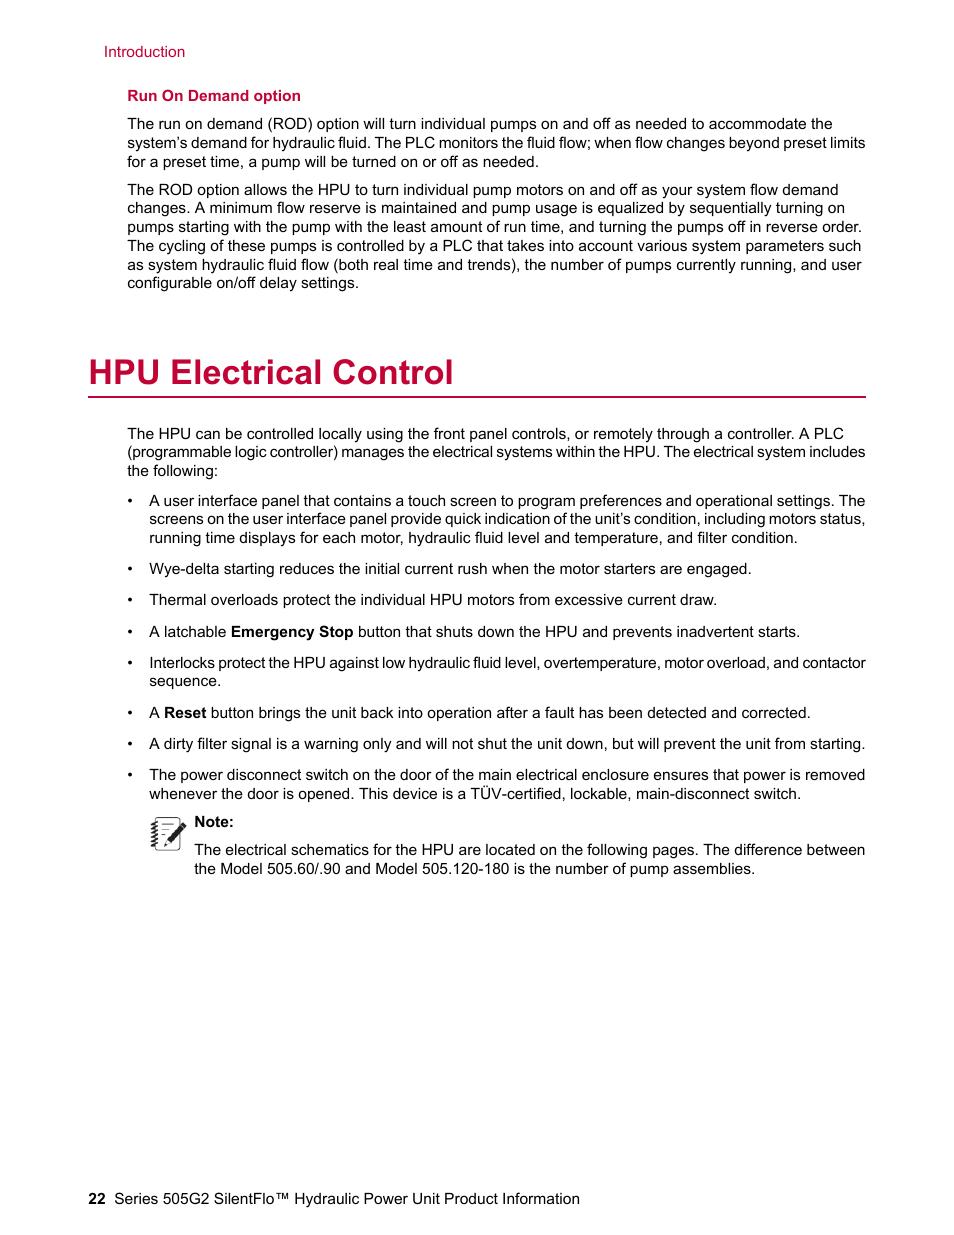 Hpu electrical control mts series 505g2 silentflo hydraulic power hpu electrical control mts series 505g2 silentflo hydraulic power unit model 505g2 180 user publicscrutiny Choice Image